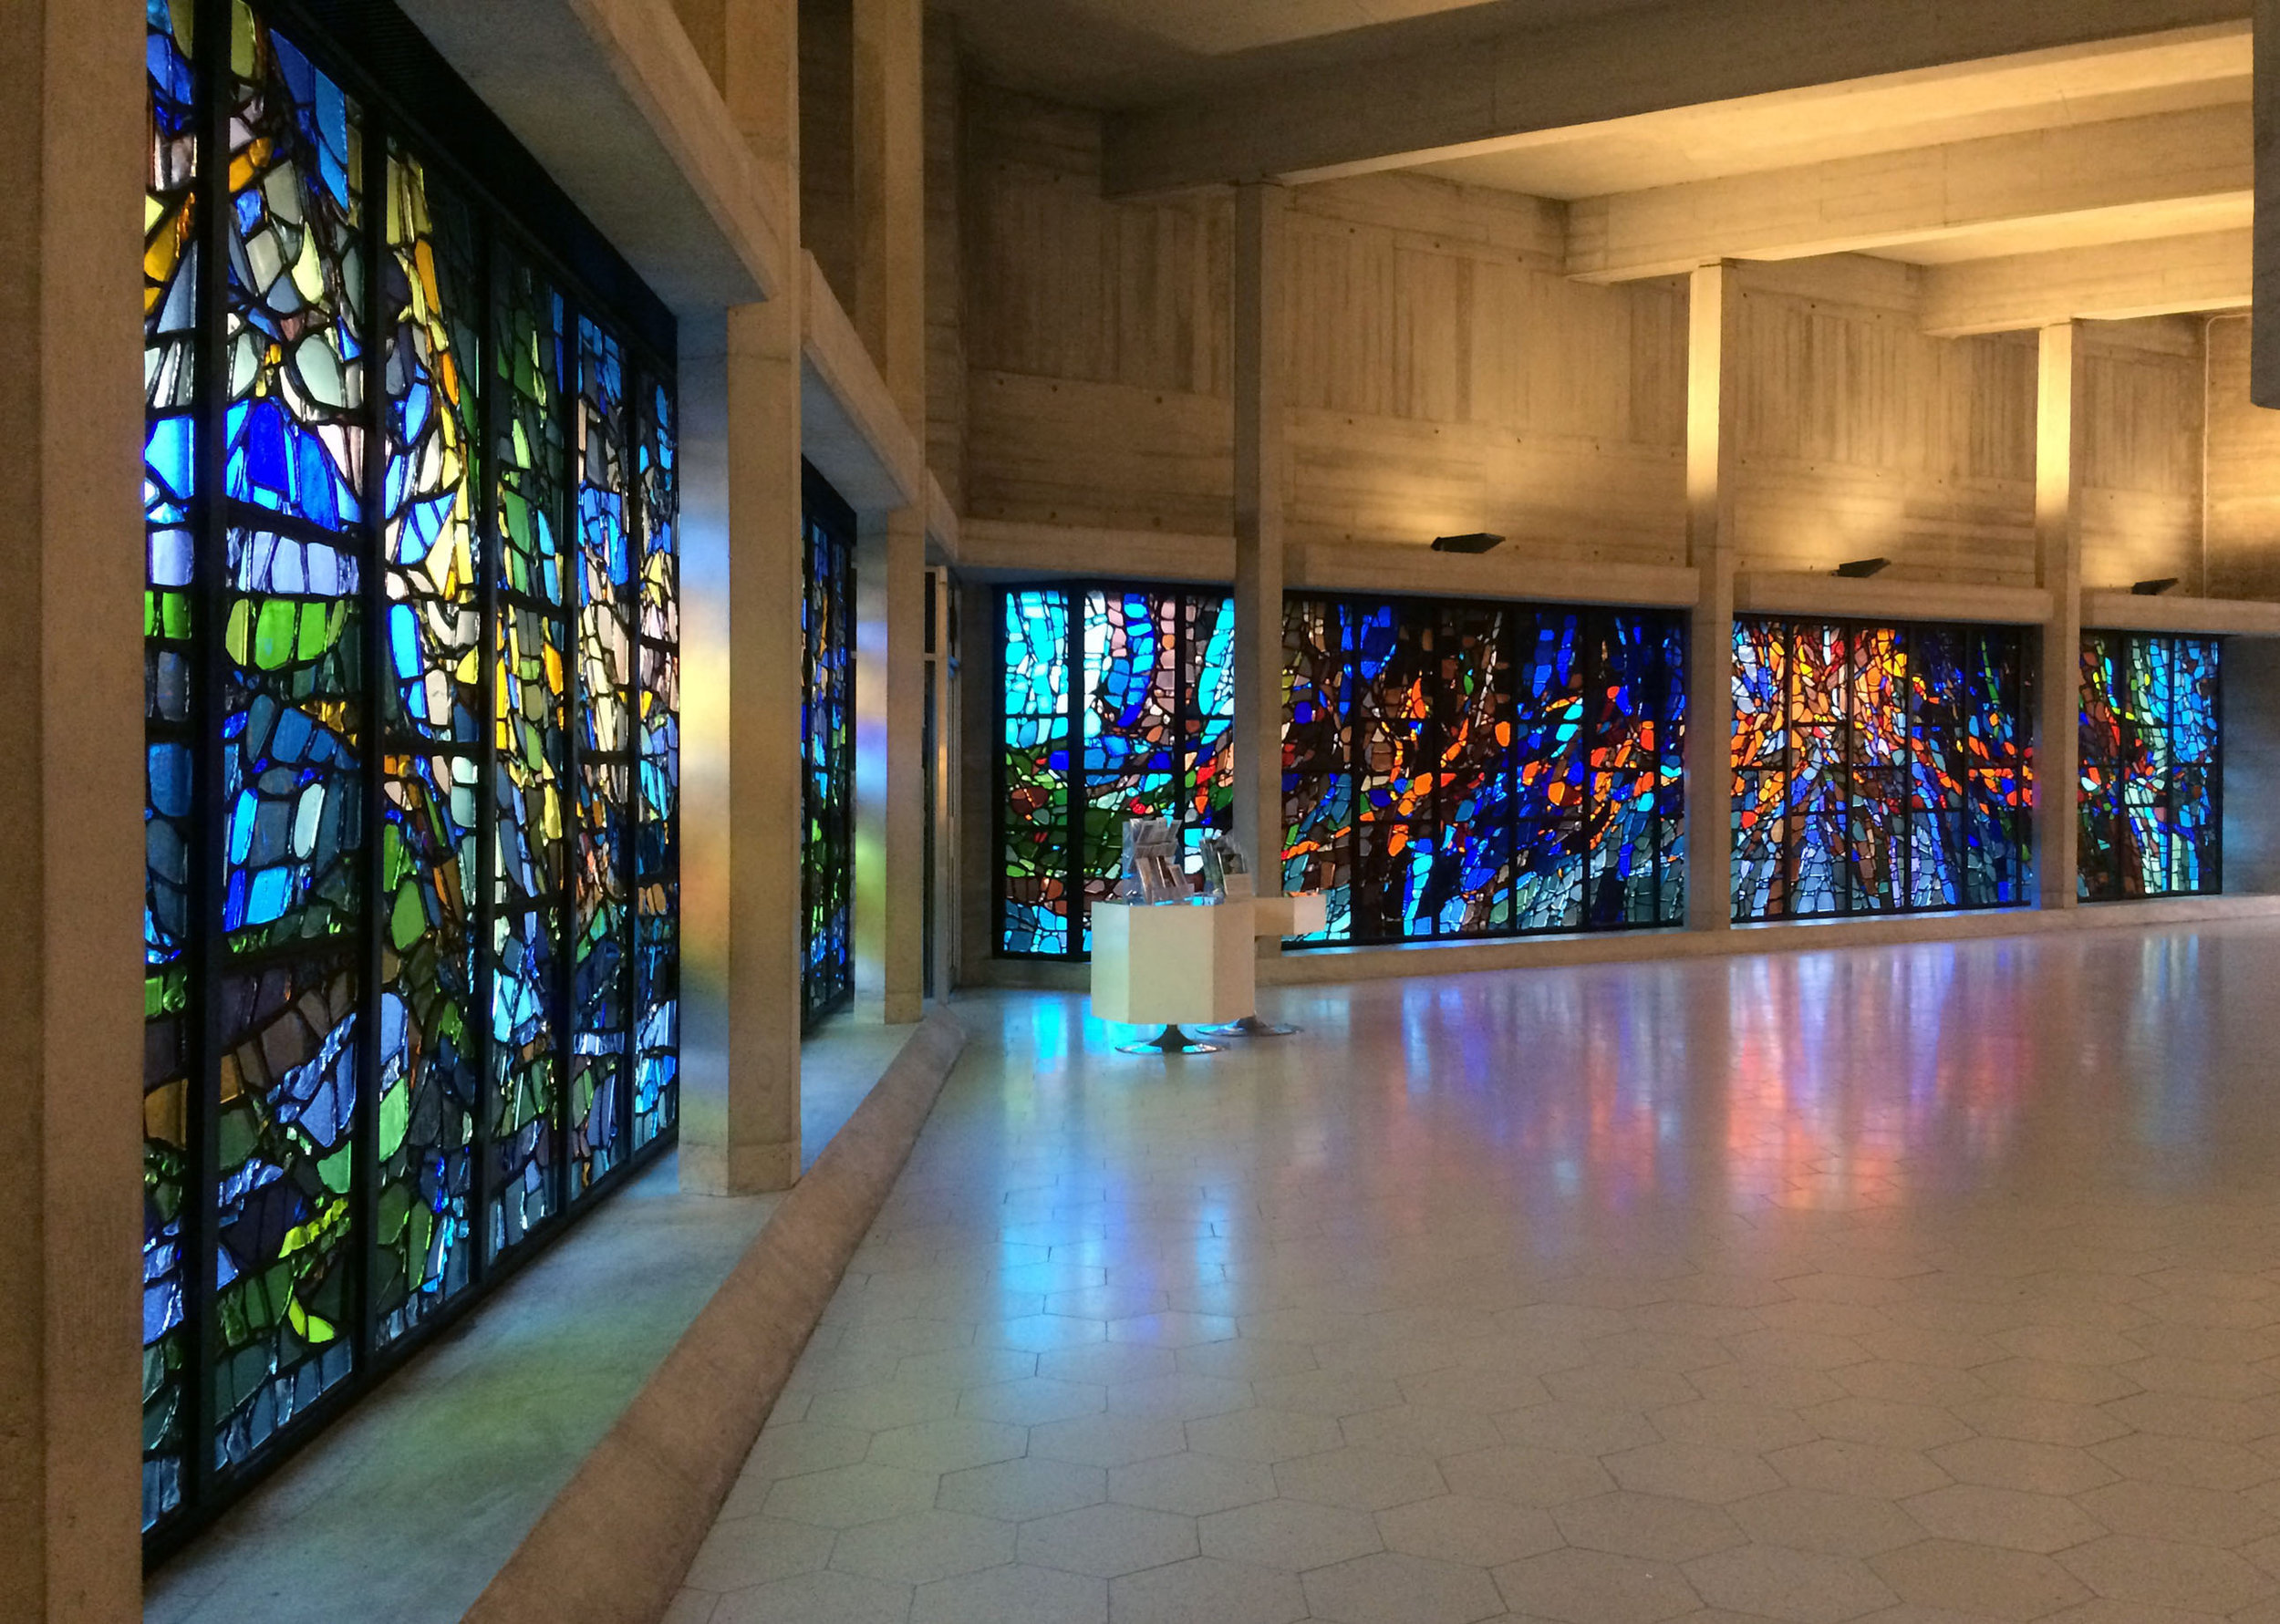 Henry Haig's dalle de verre windows